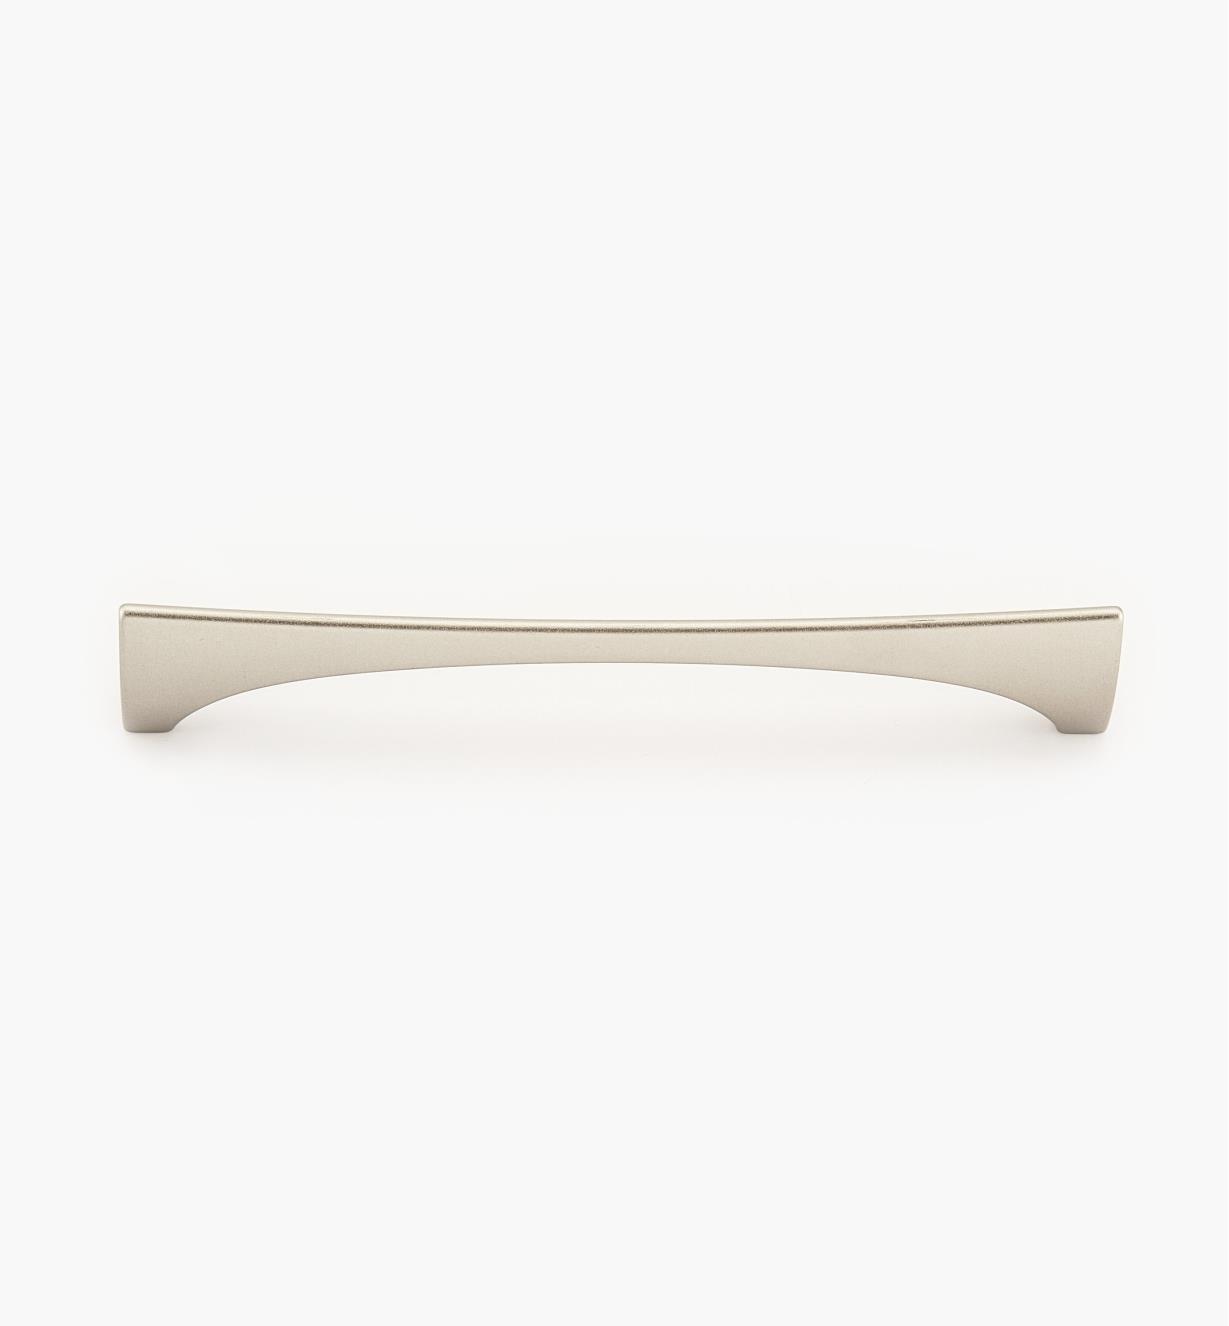 02W3912 - Poignée Niteroi, fini palladium, 160 mm